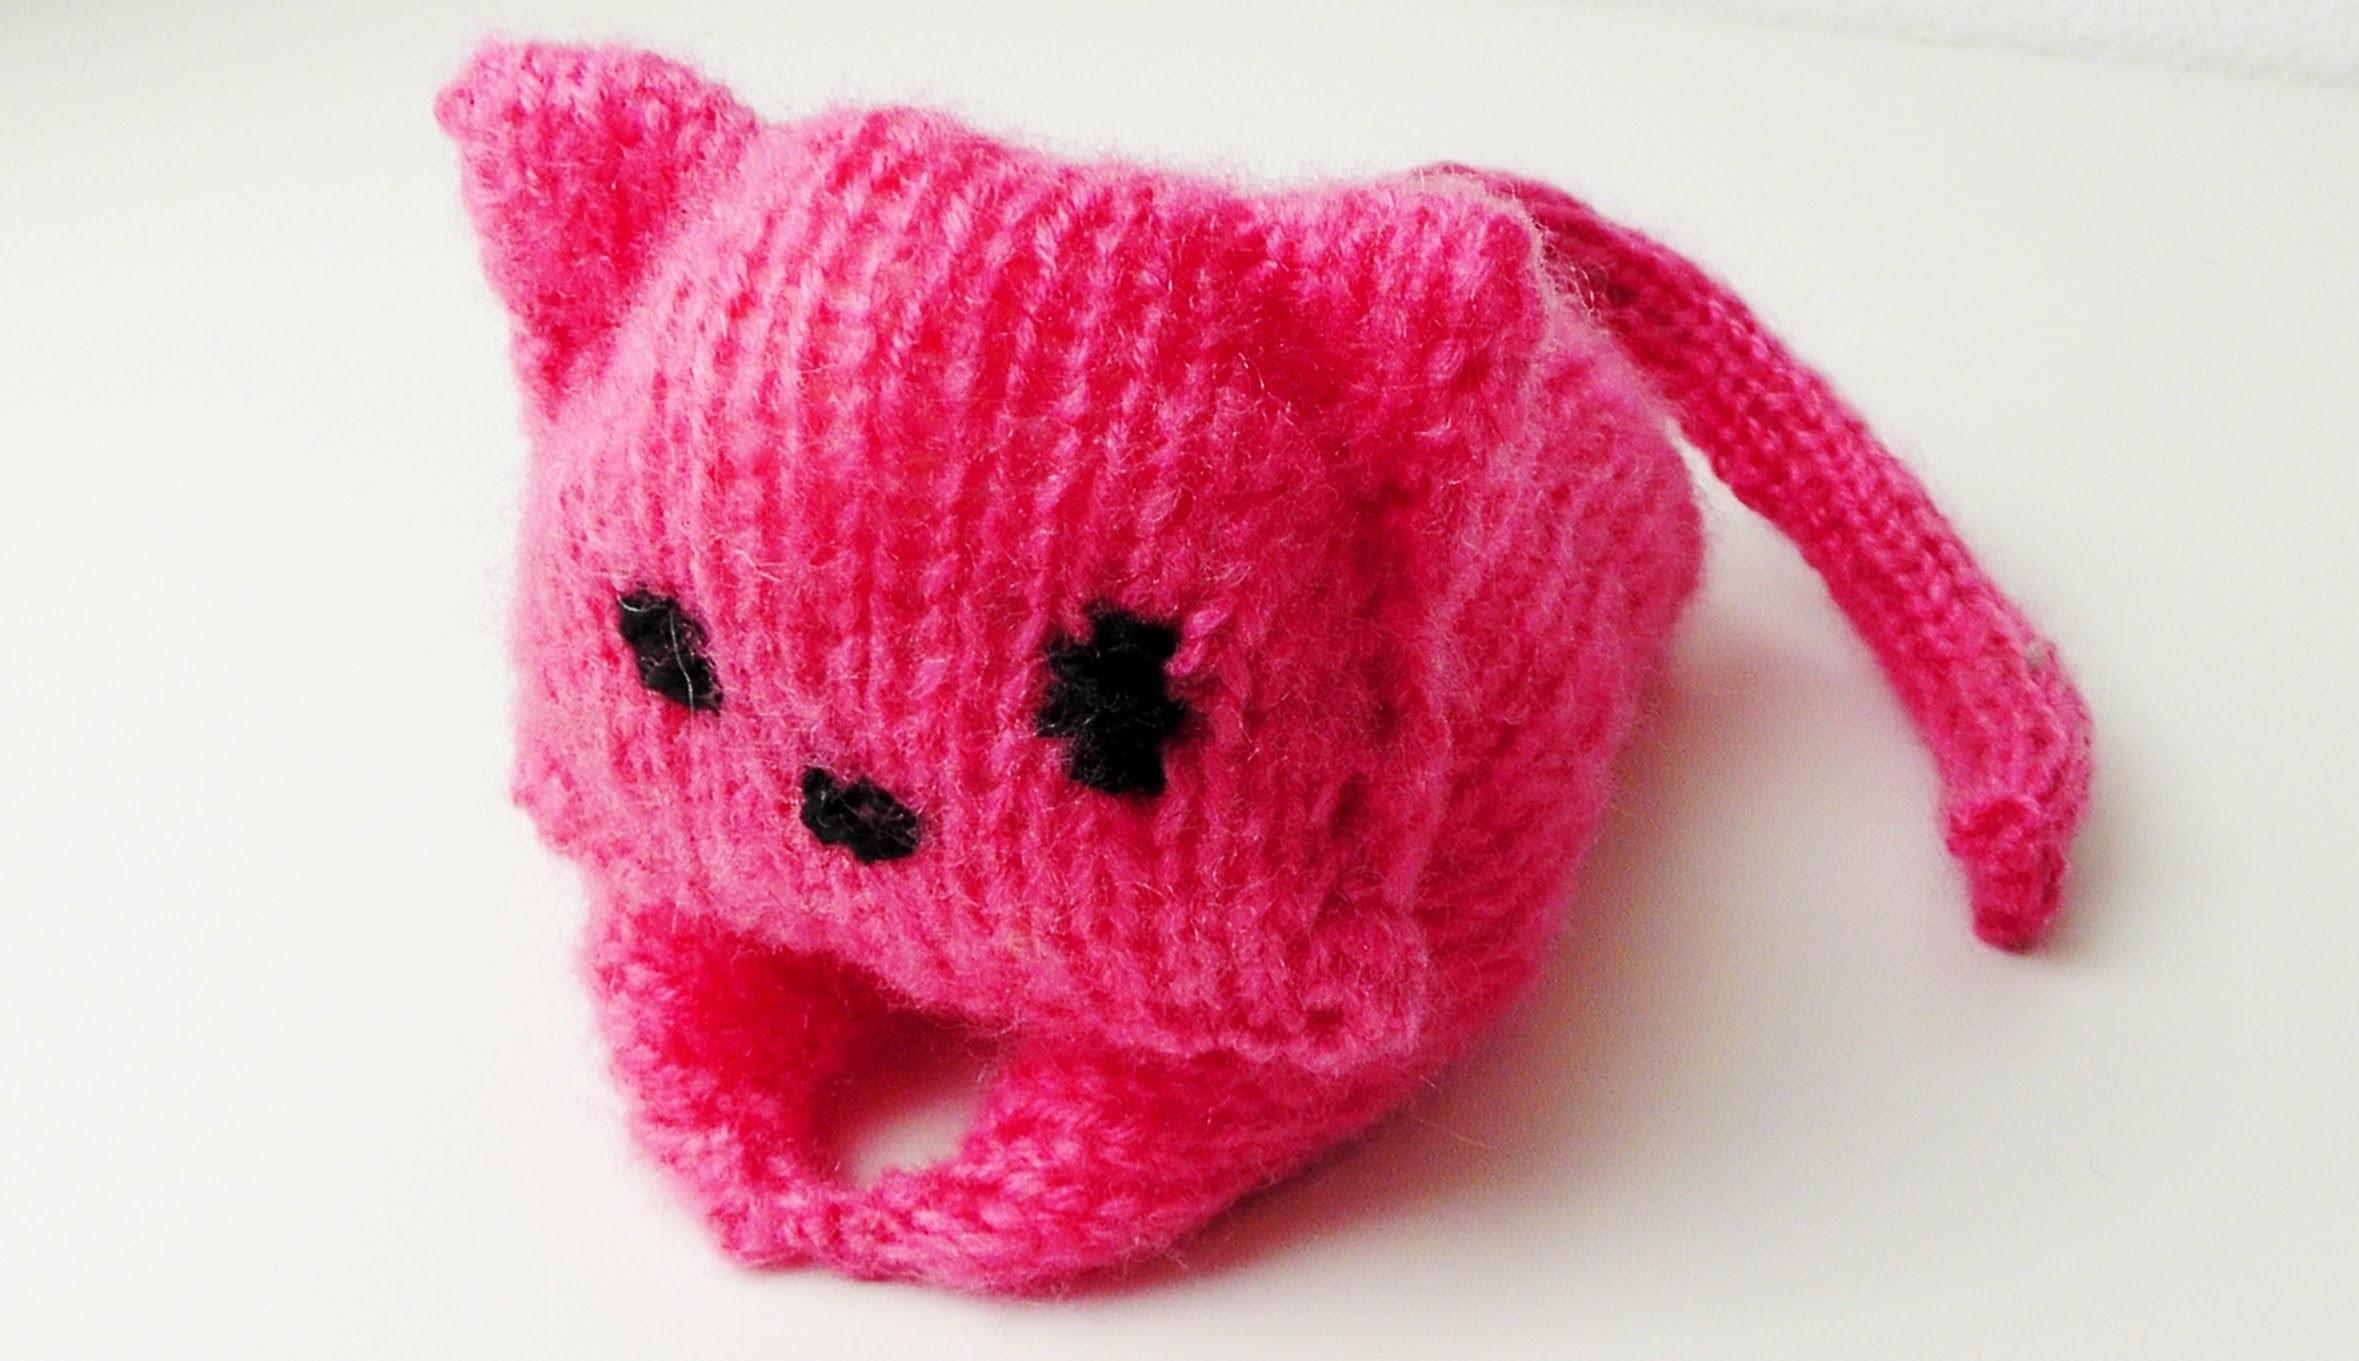 Amigurumi Katze stricken lernen, My Crafts and DIY Projects